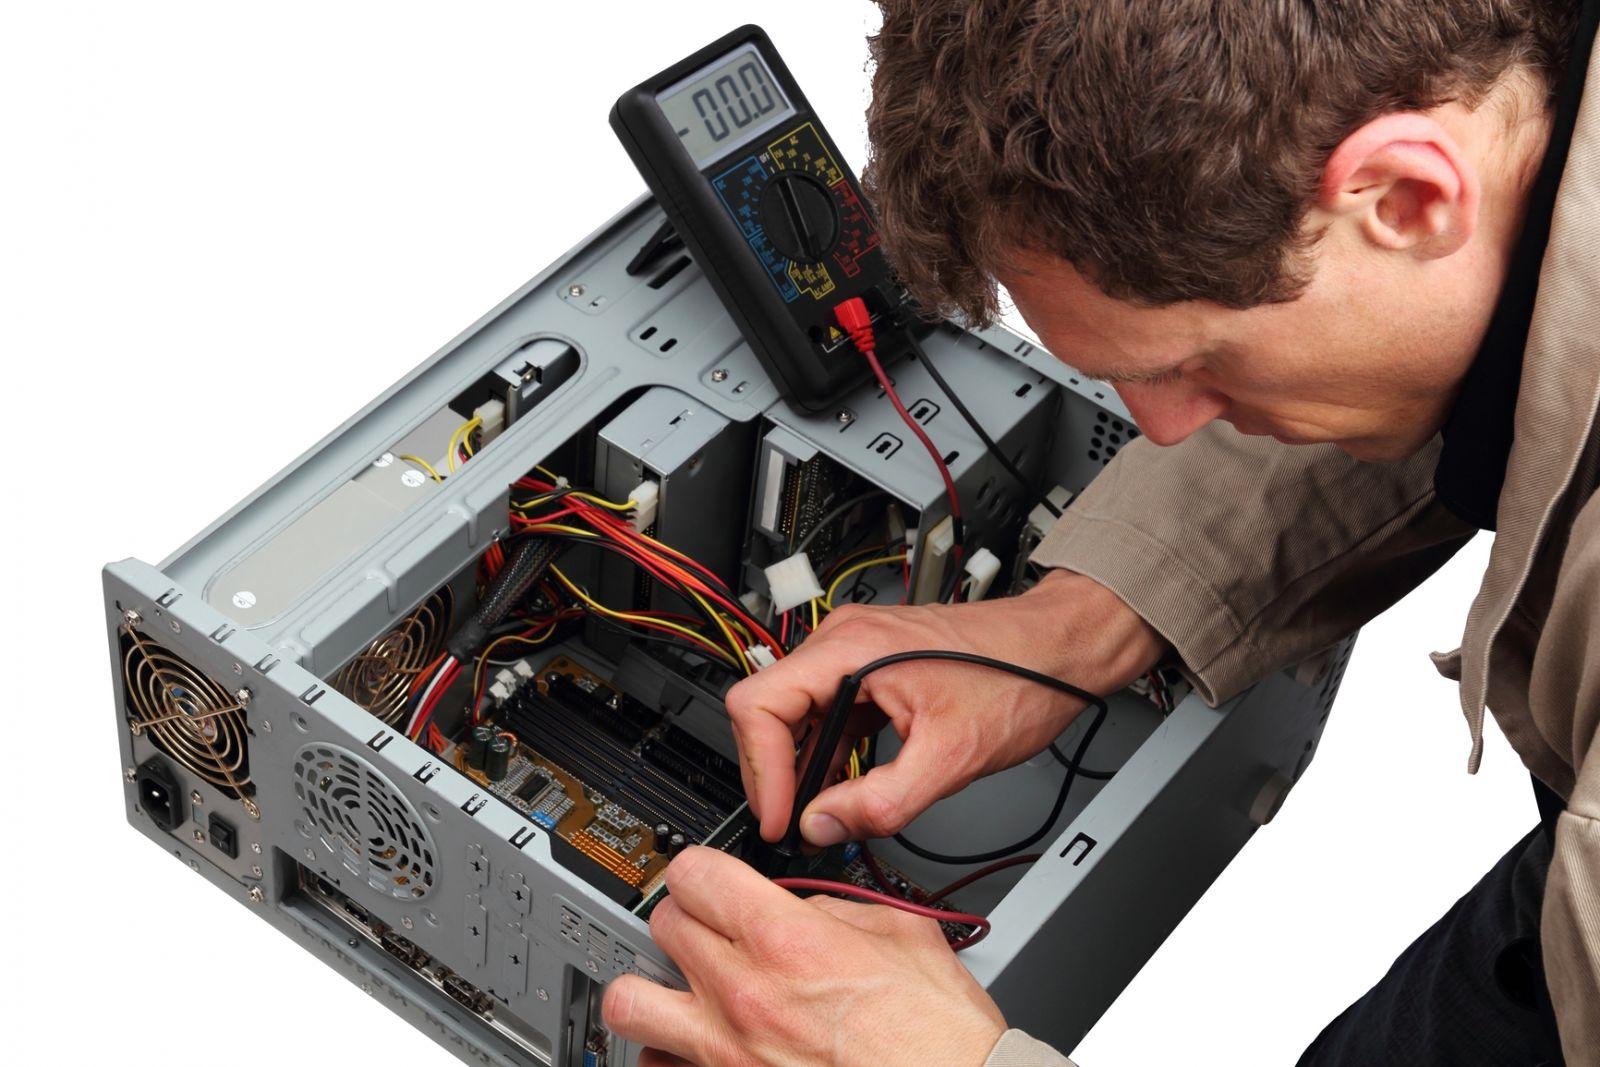 Lắp ráp máy tính quận 4